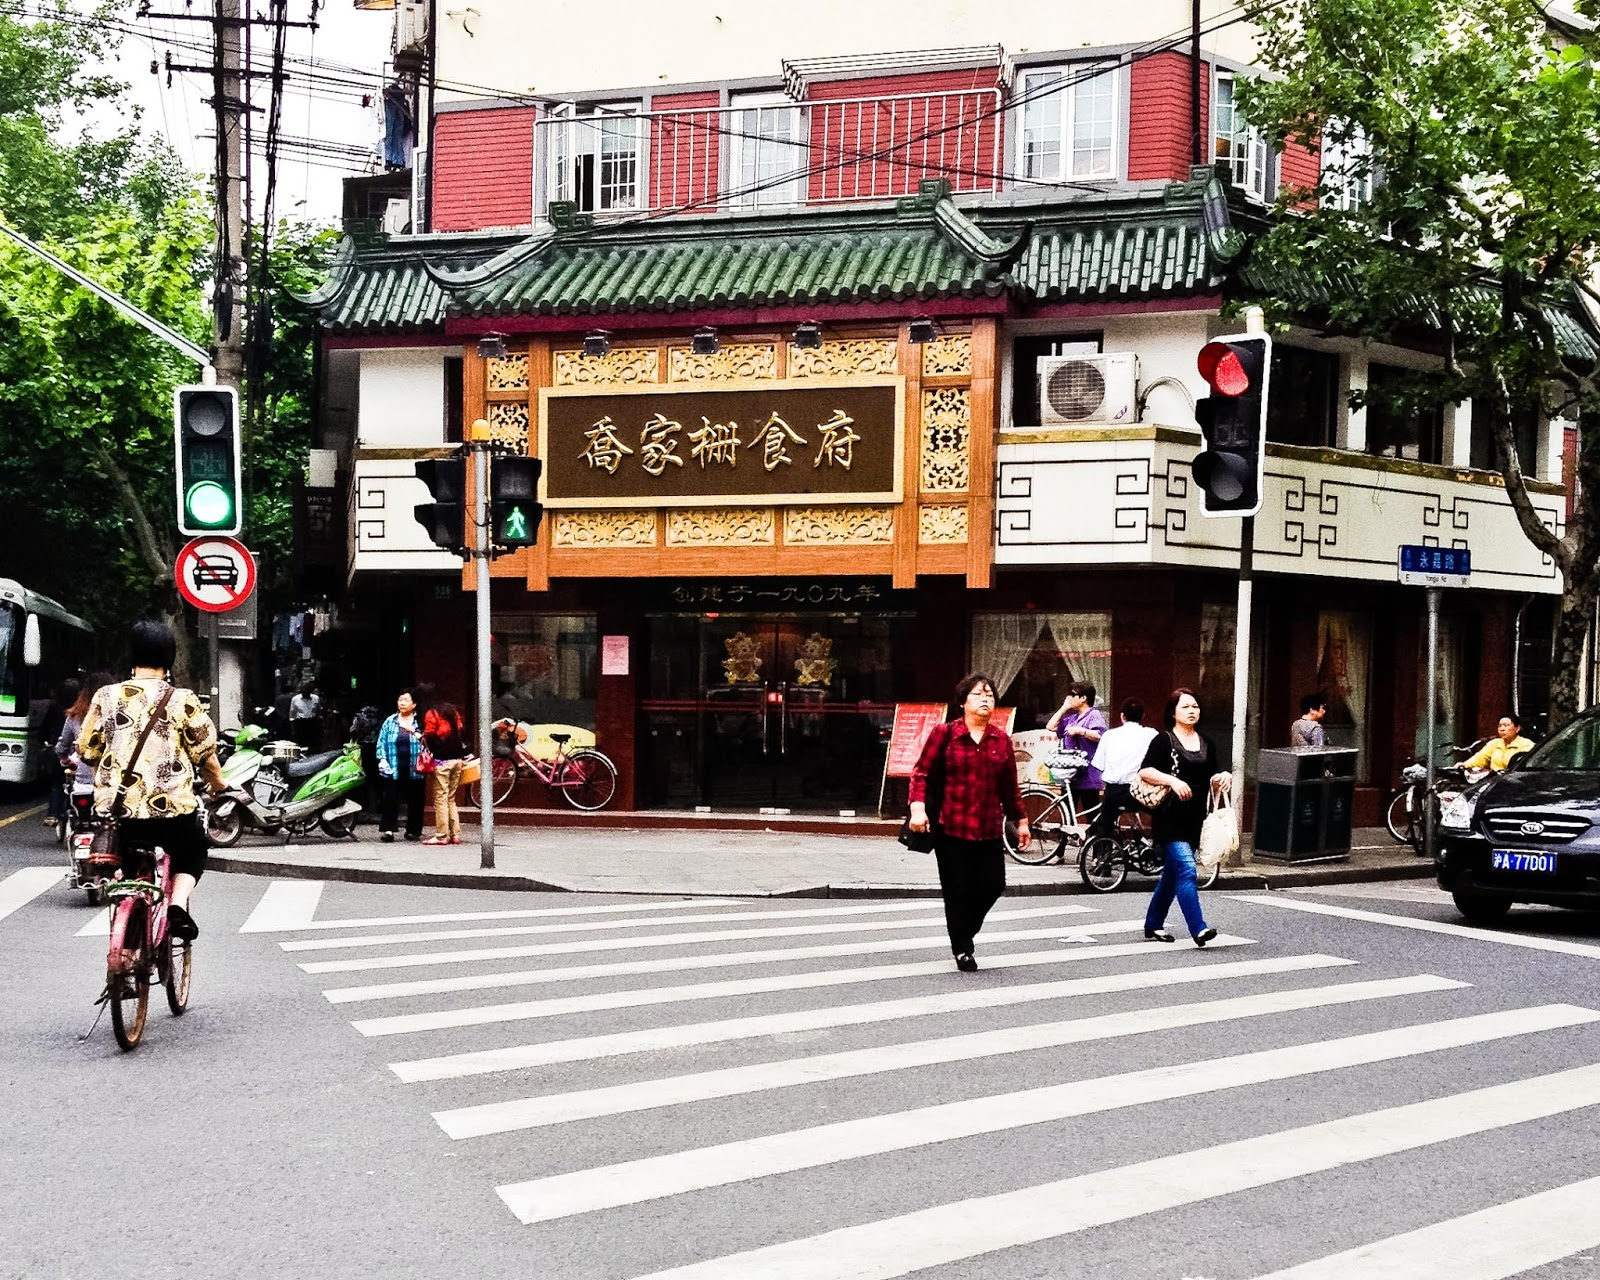 Restaurant Xinjiang Paris